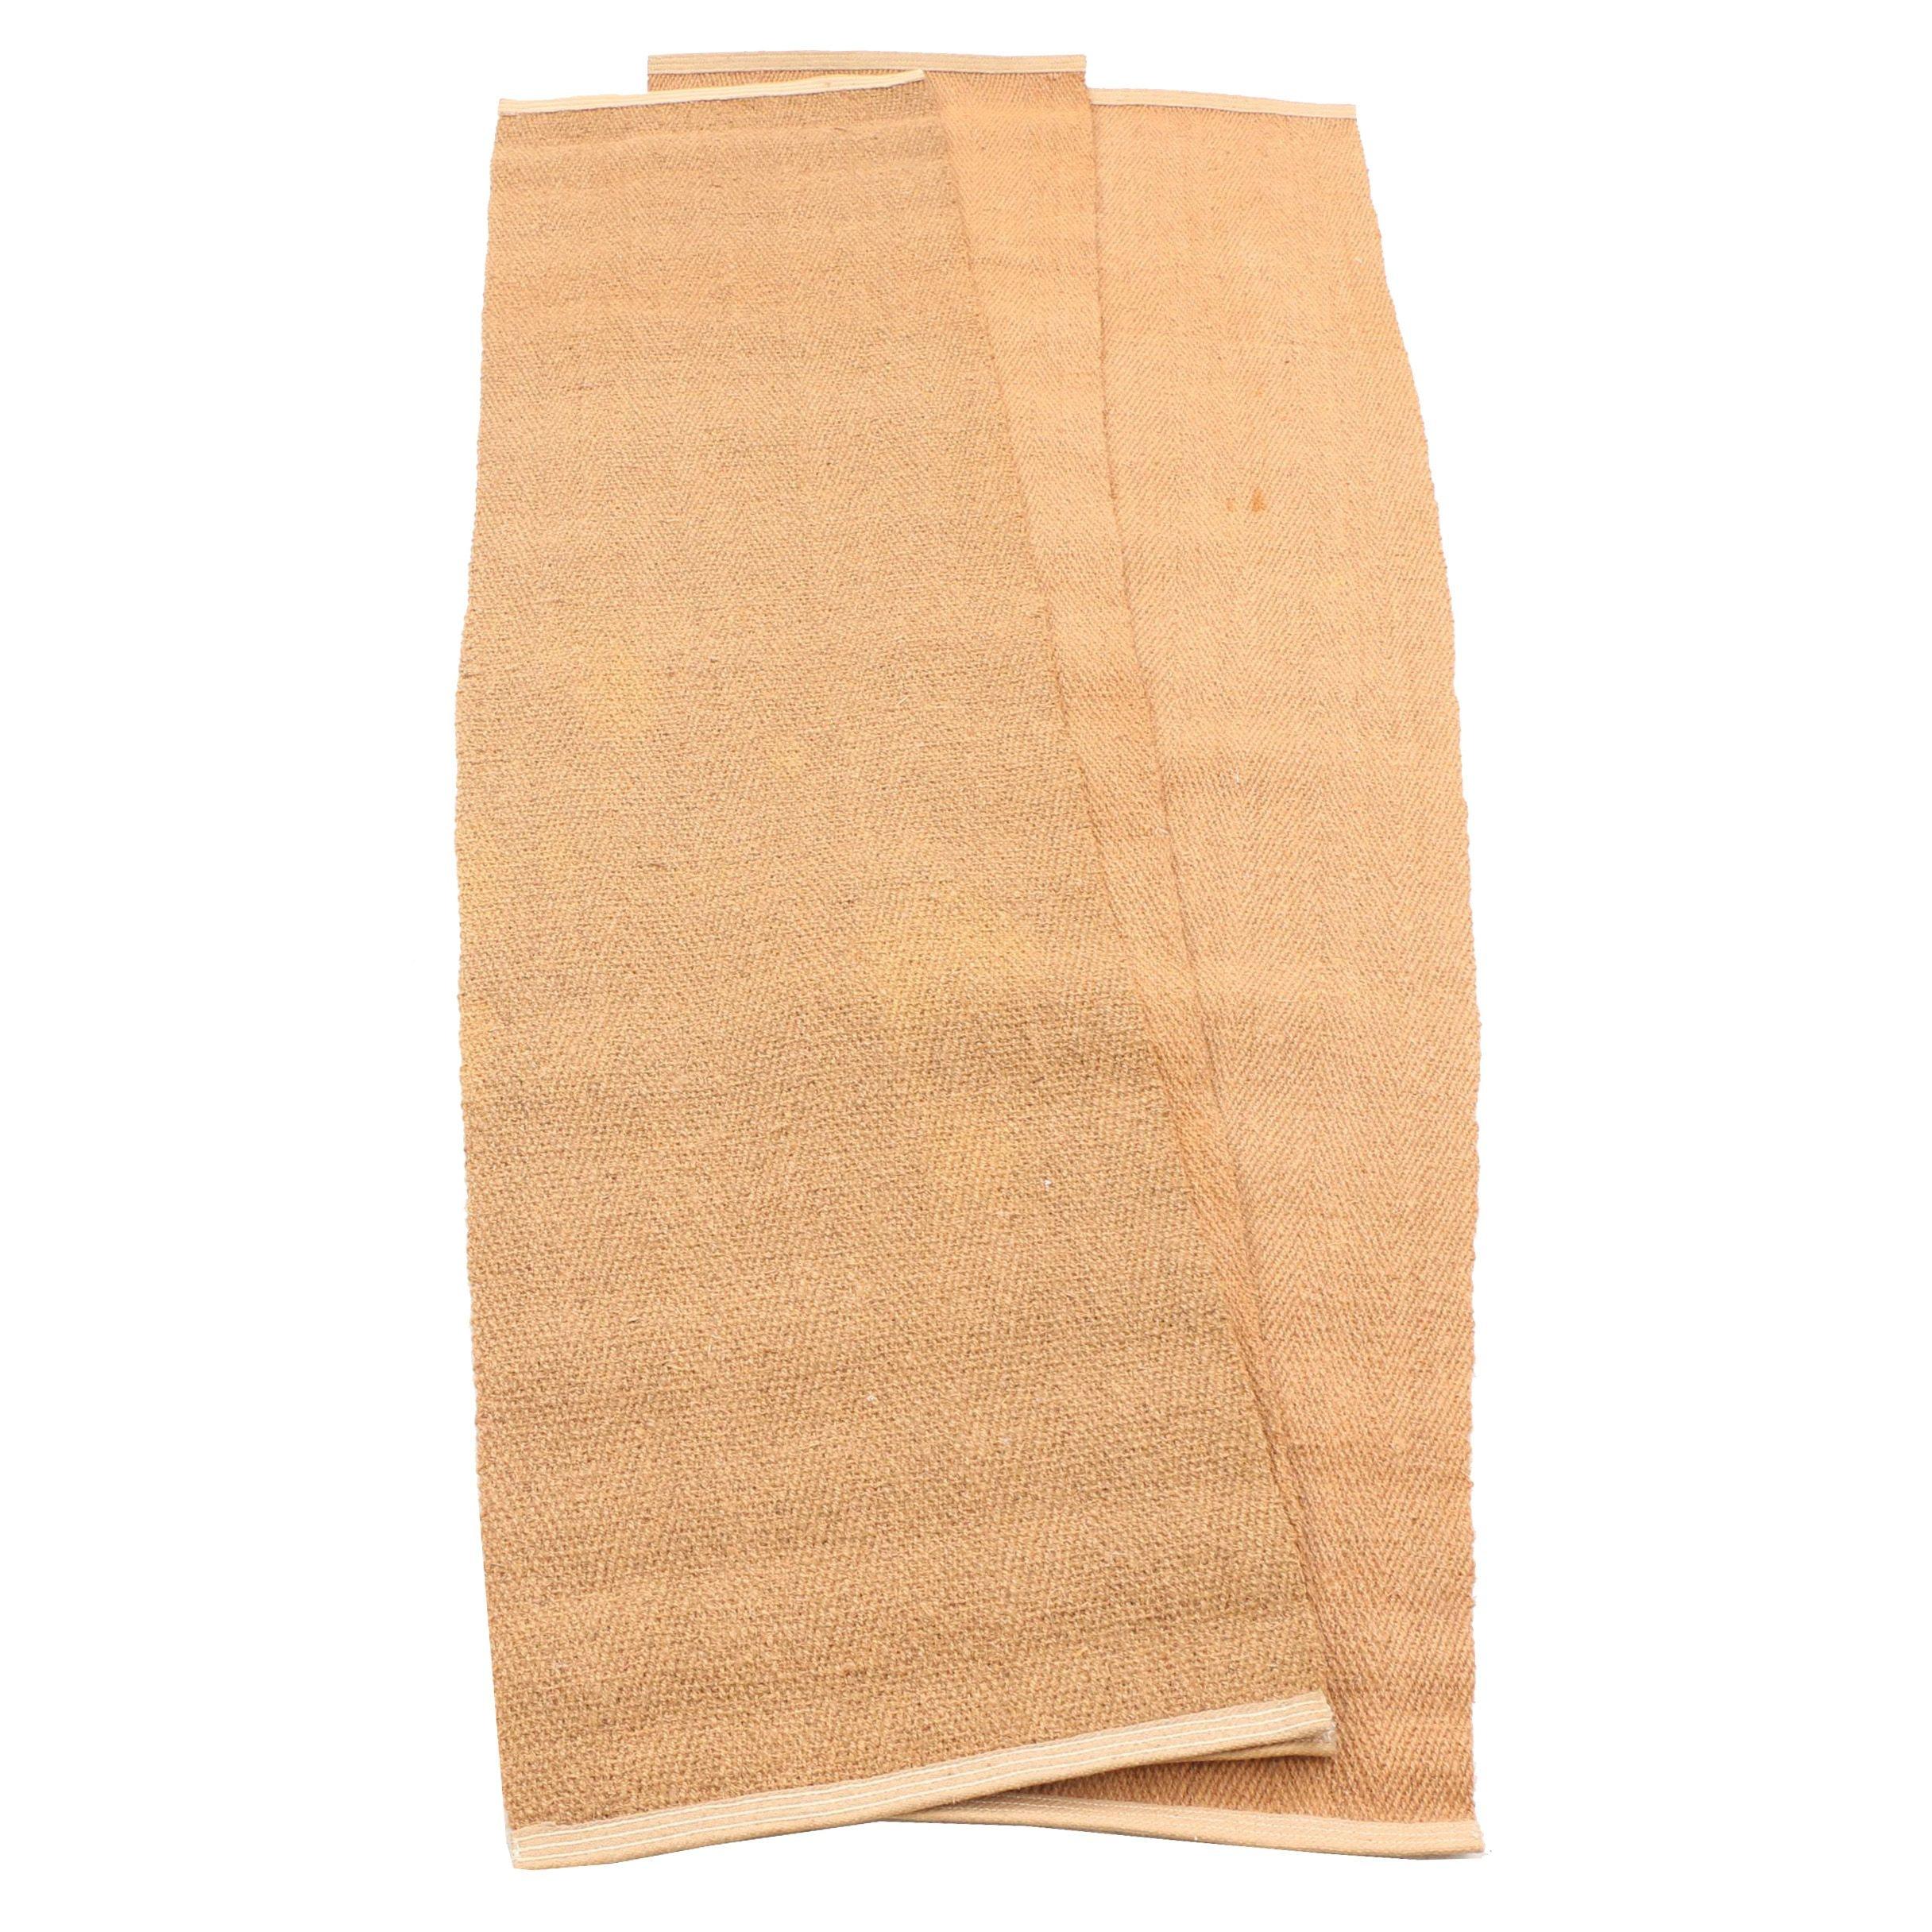 Woven Natural Sisal Rugs